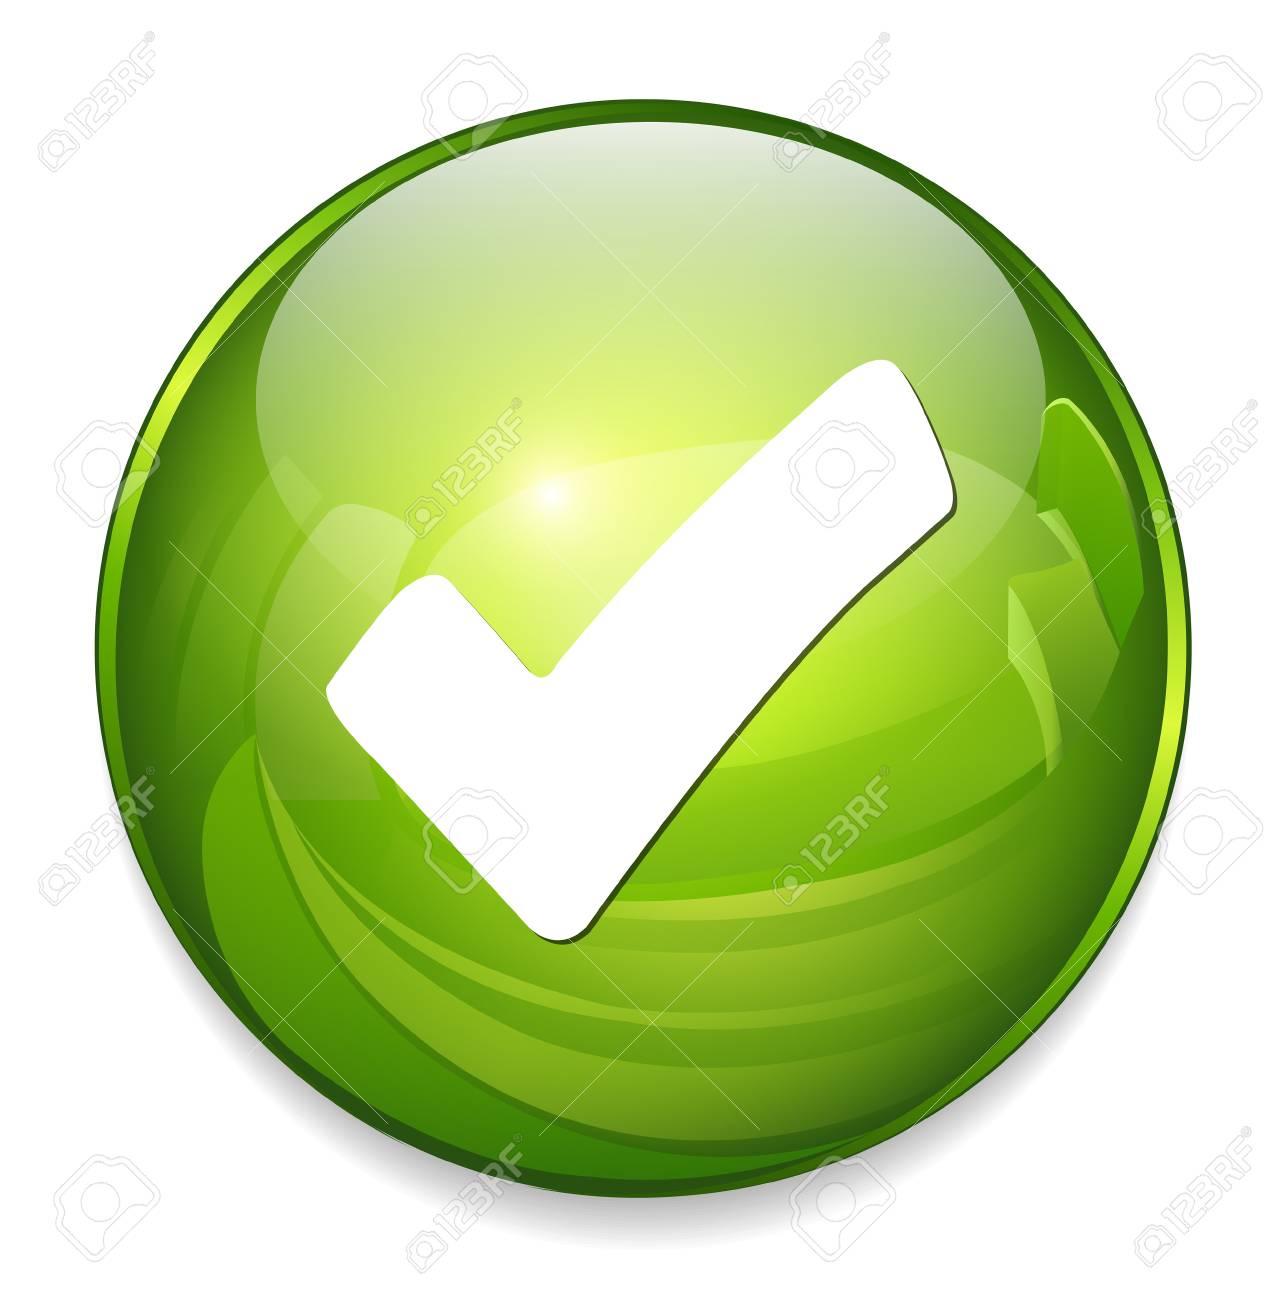 check mark icon - 37533323